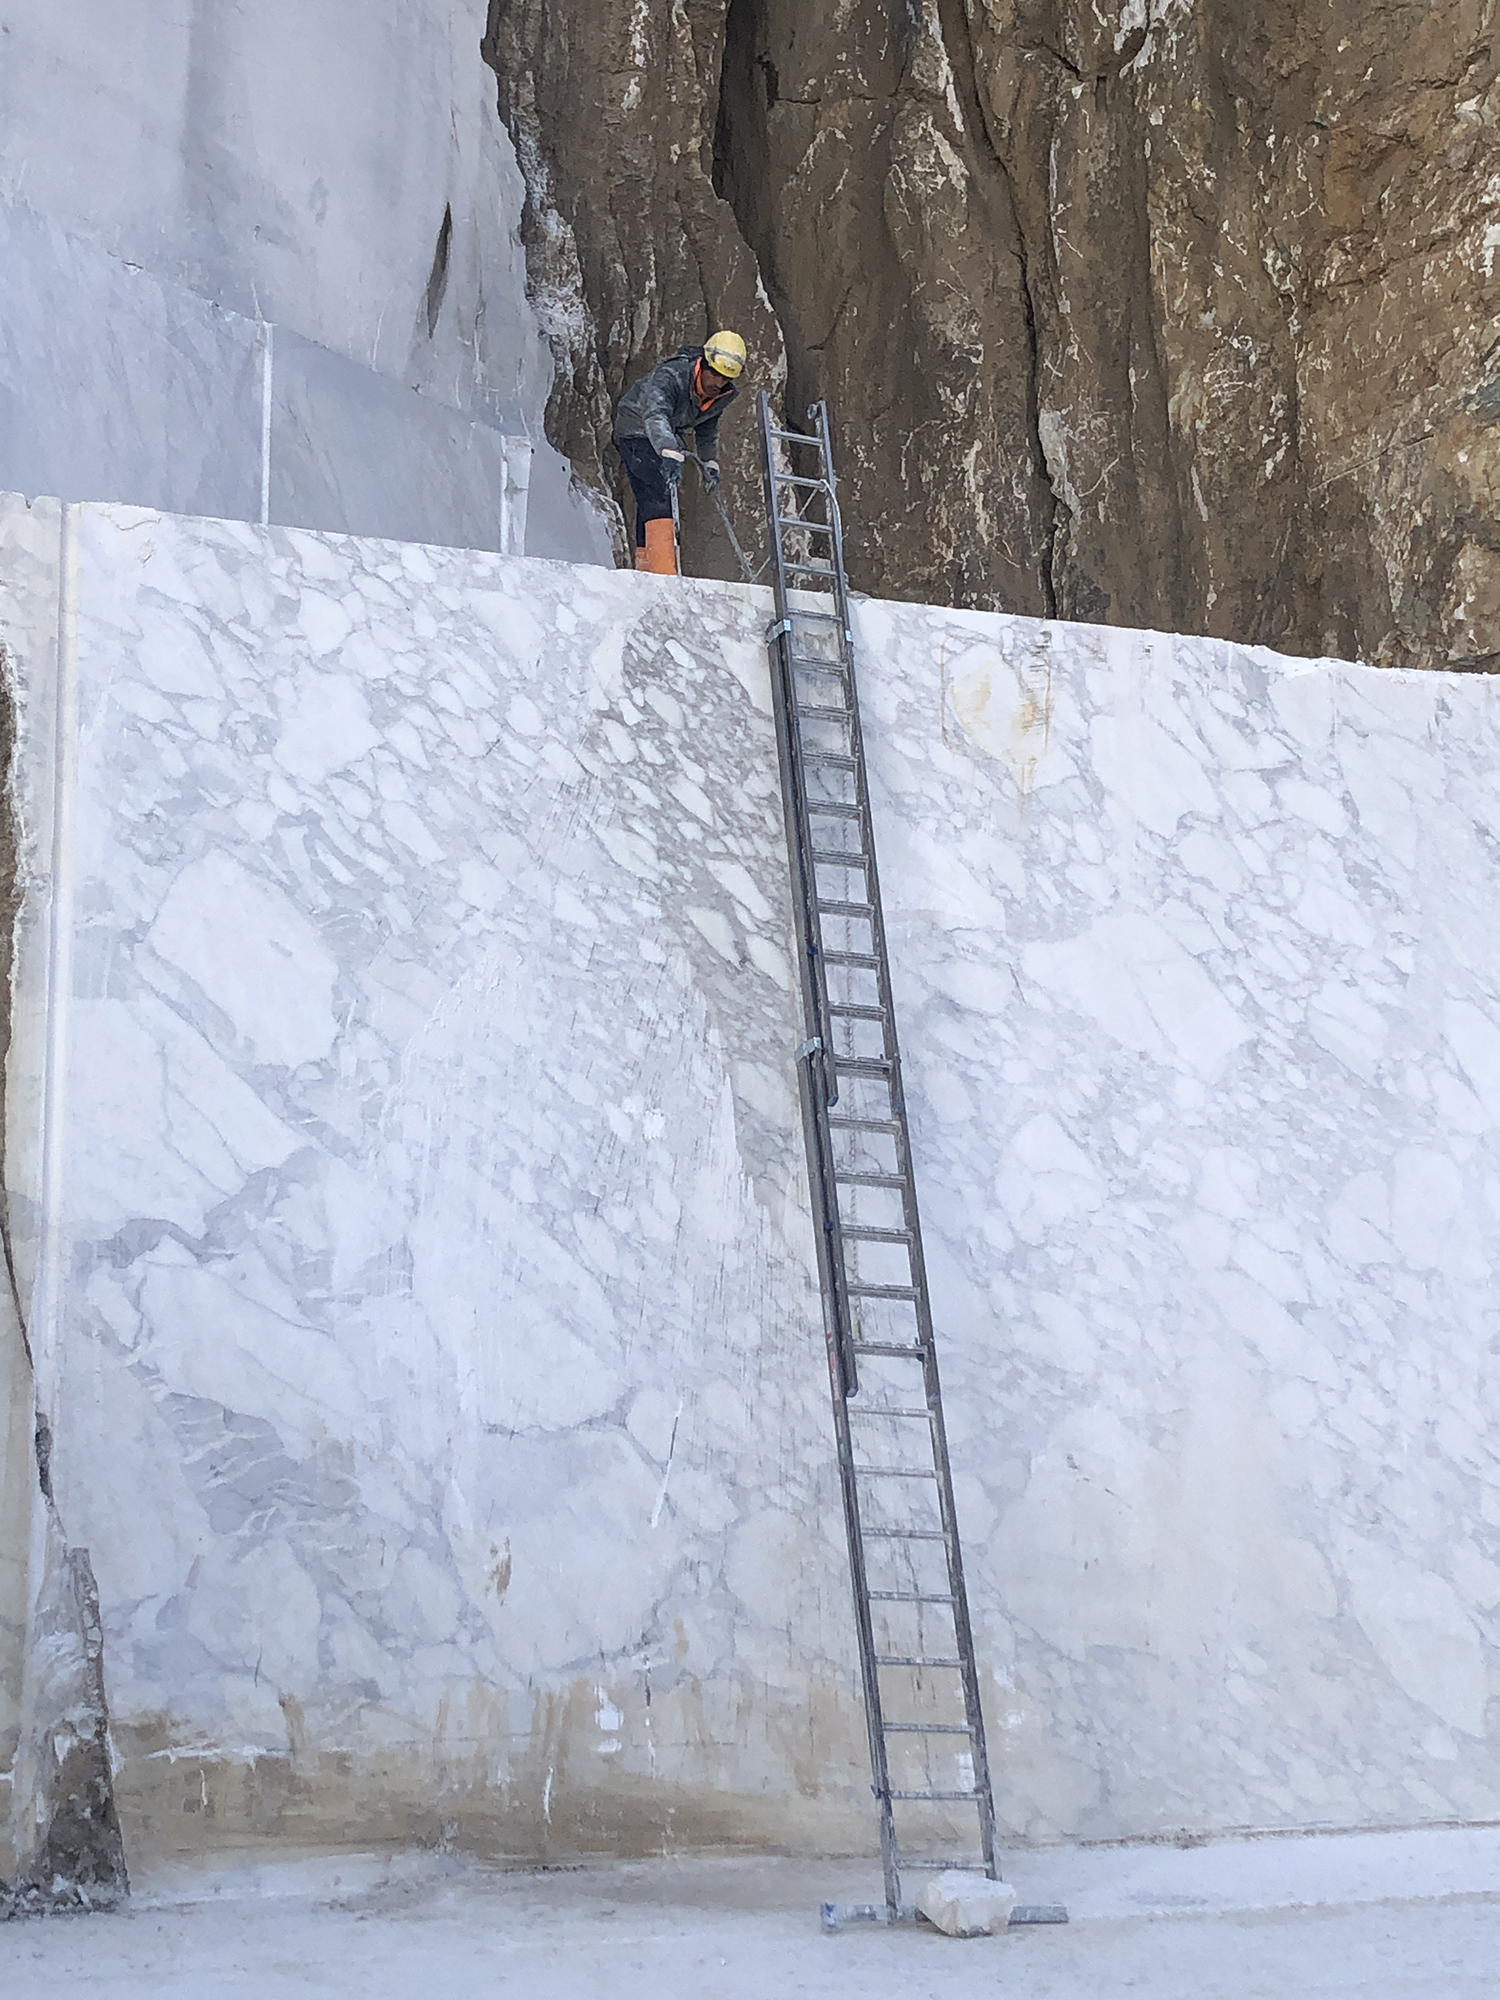 ARABESCATO VAGLI Marble - Sourced from our craftsmen quarries in Tuscany.Arabescato Vagli is a marble with an ancient history.Characterisedby a white background with light grey shades and pattern. <ul>  <li>Ultimate tensile strength (UTS) to pressure stress: 1.462 Kg/Cm2</li>  <li>Ultimate tensile strength (UTS) after freezing cycles: 1.260 Kg/Cm2</li>  <li>Ultimate tensile strength (UTS) to bending stress: 75 Kg/Cm2</li>  <li>Thermic linear dilatation 10-6 per °C : 9,4</li>  <li>Water absorption coefficient % in WeighT: 0,23</li>  <li>Weight per unit volume: 2.684 Kg/m3</li>  <li>Impact strength: 40,0 Cm</li>  <li>Module of linear elasticity: 406.000 Kg/Cm2</li>  <li>Abrasion strength: 8,14 mm</li> | Matter of Stuff